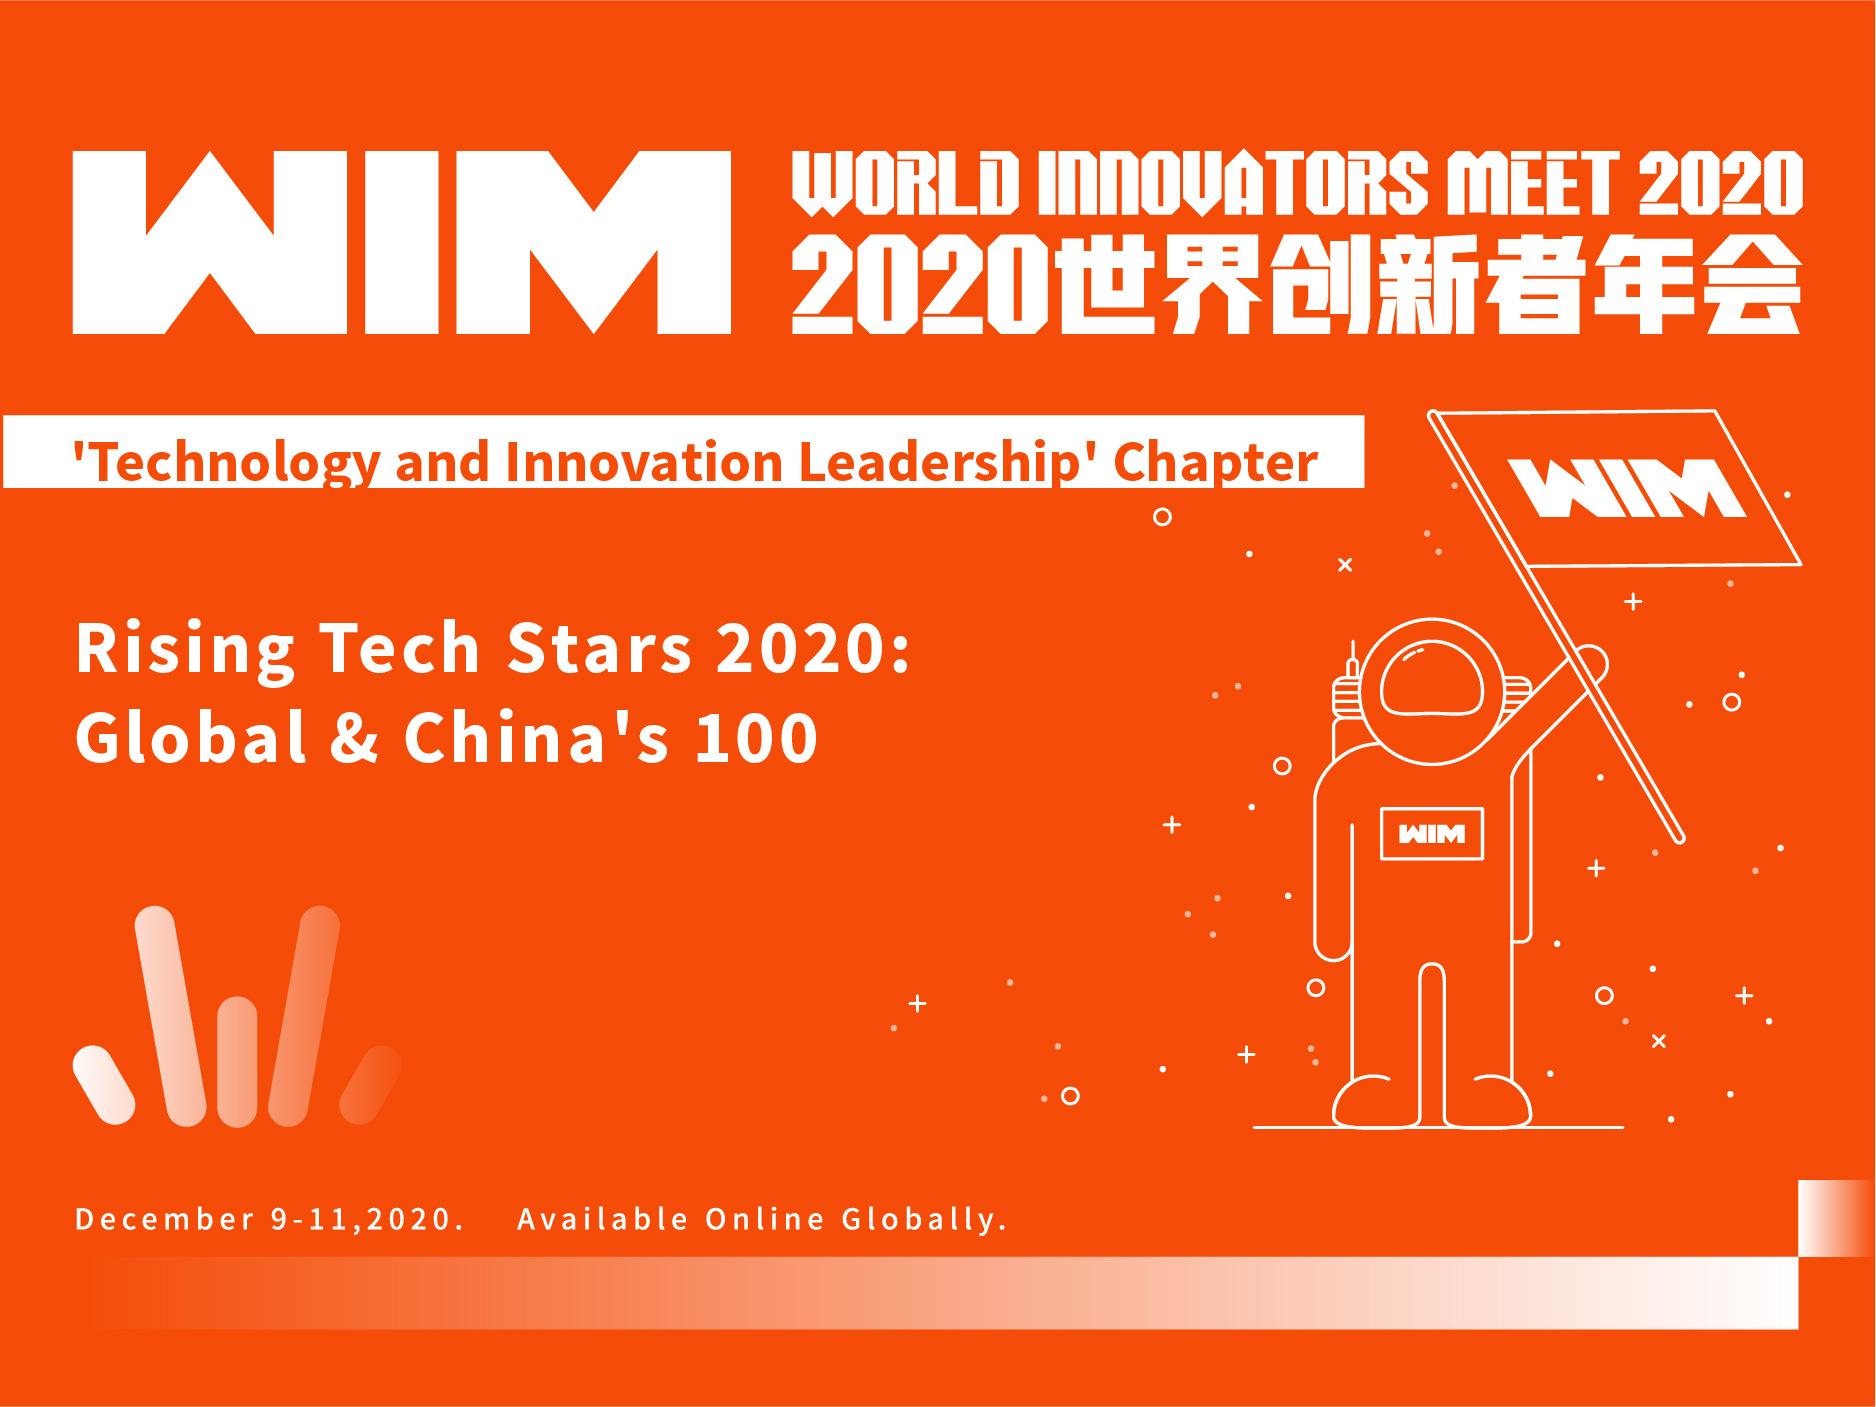 100 Rising Tech Stars